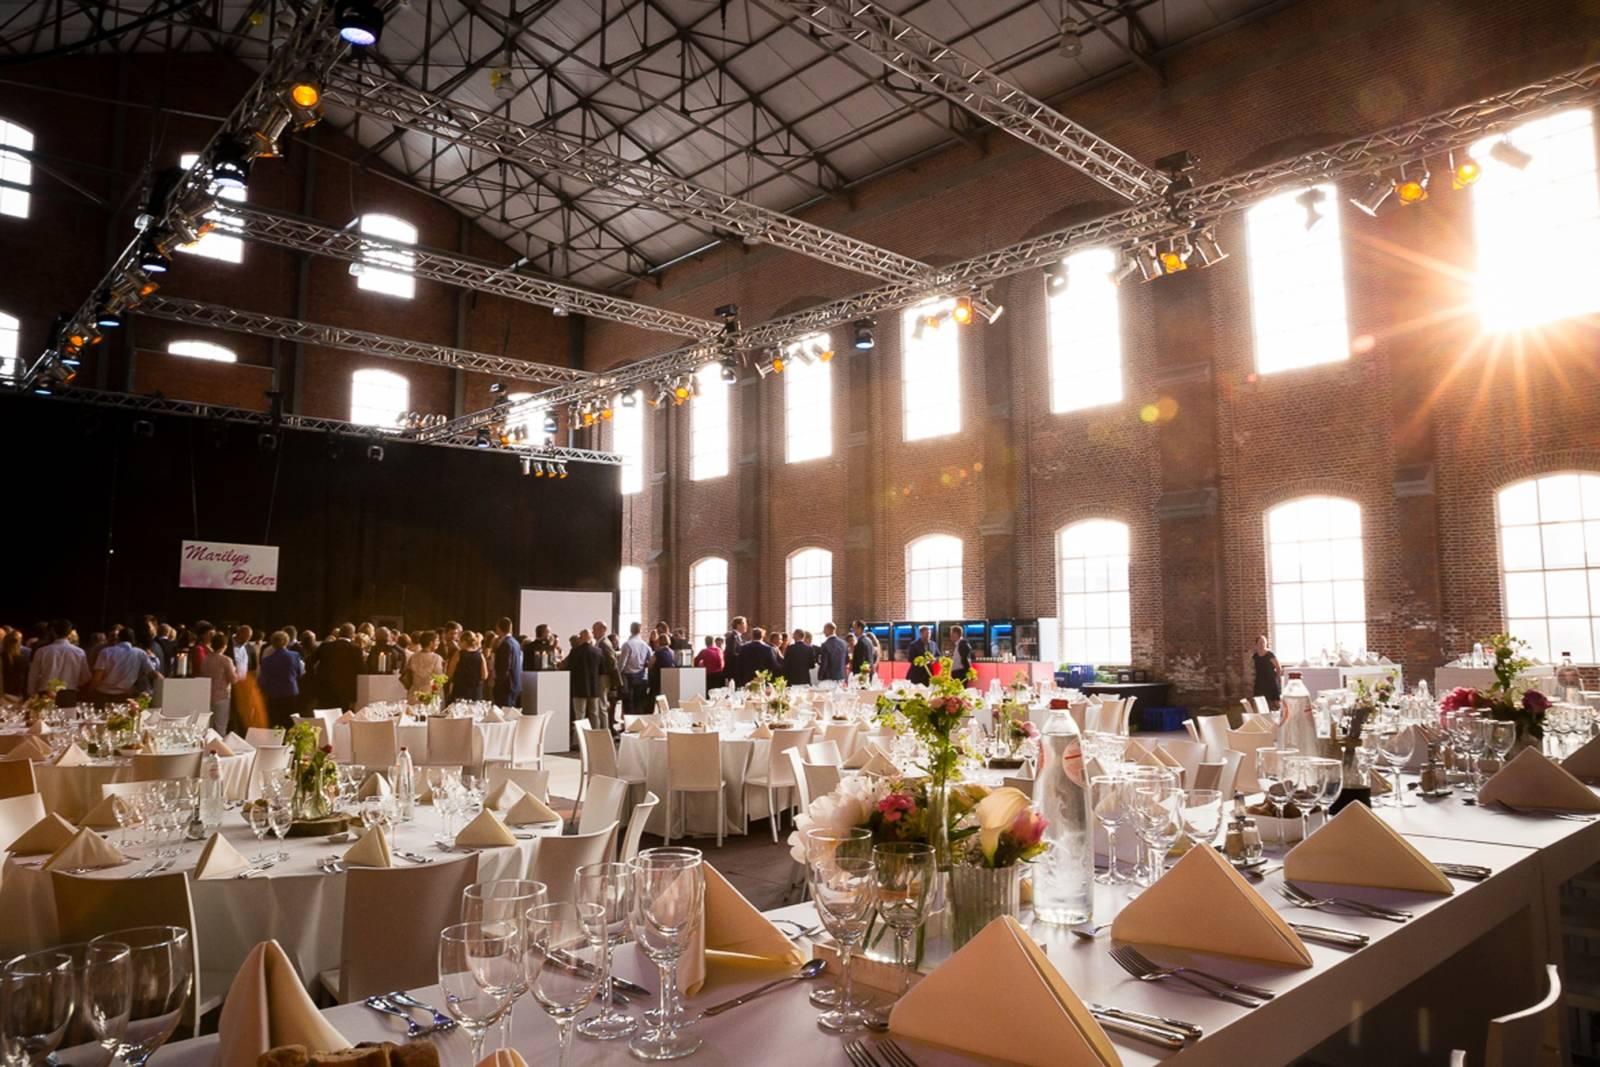 Hangar 43 - Feestzaal Oost-Vlaanderen - Industrieel - House of Weddings - 12